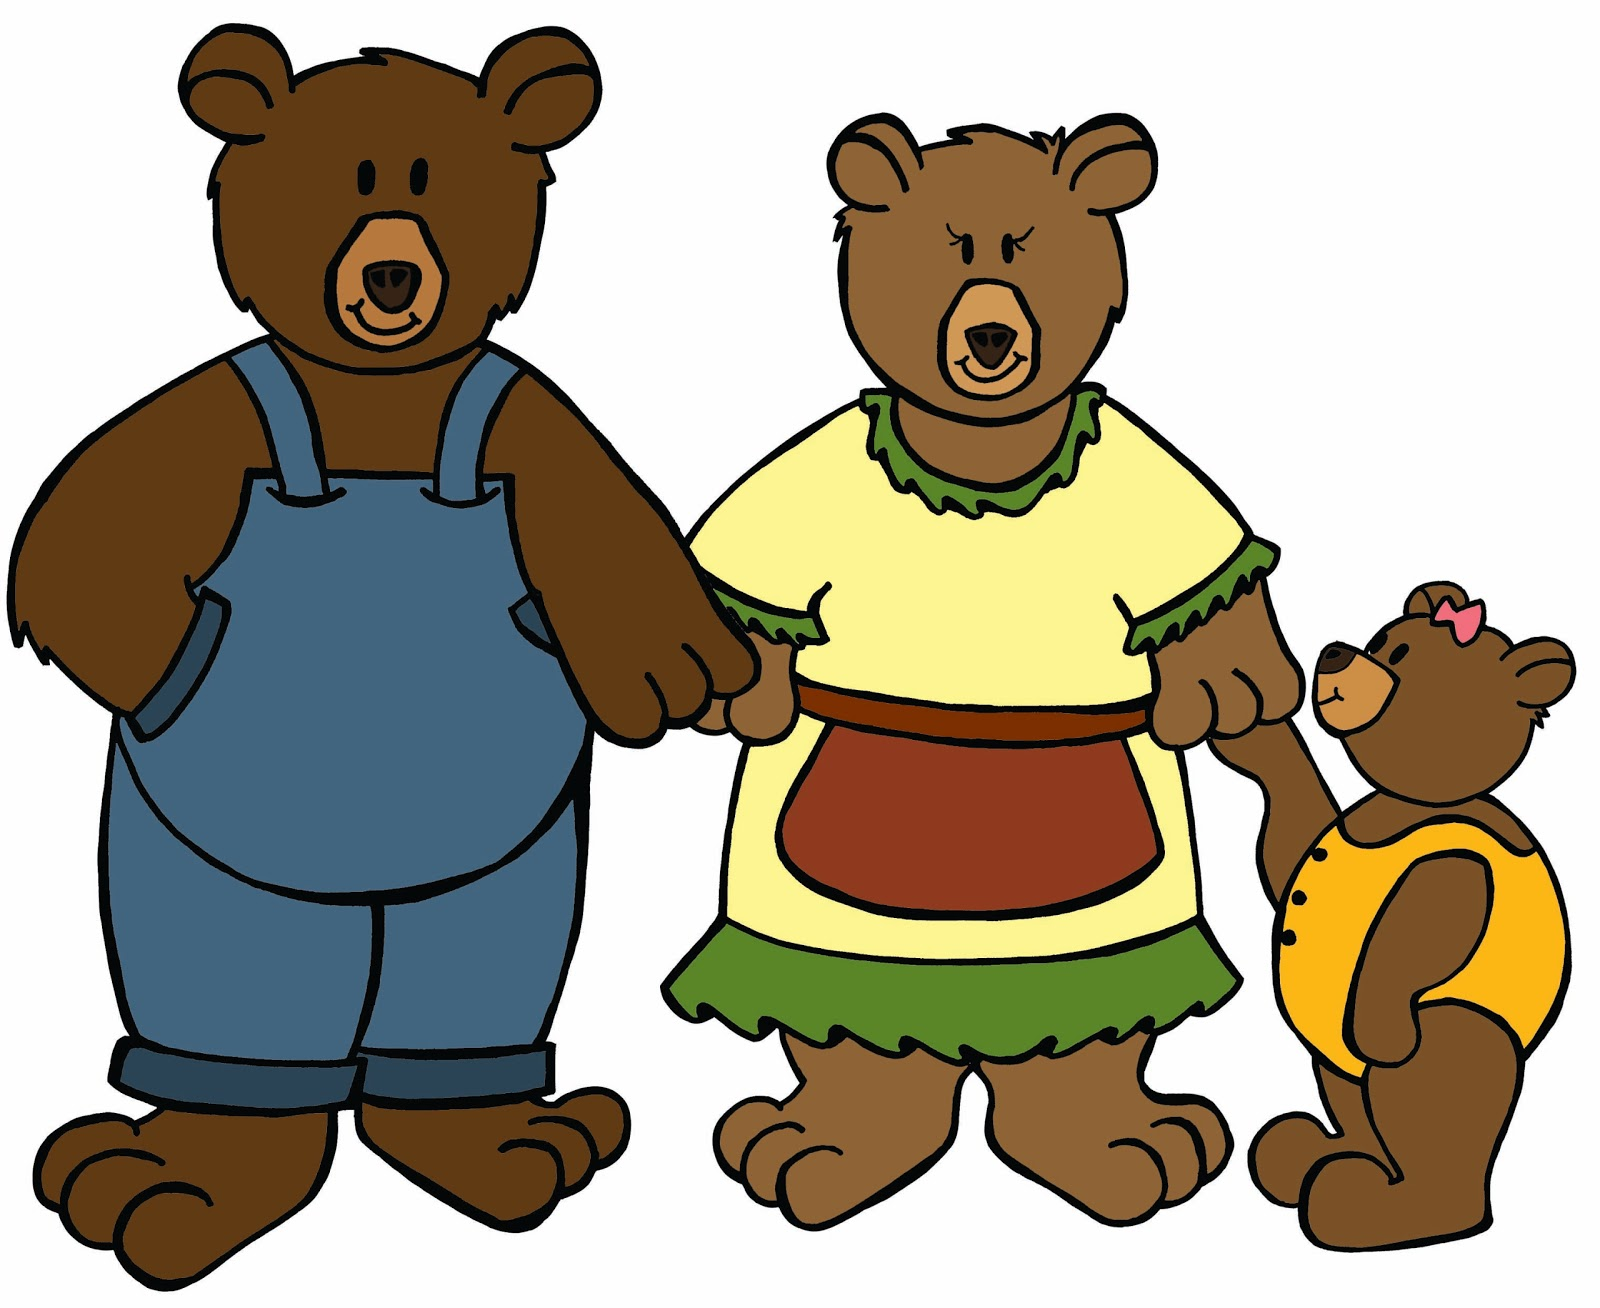 Kindergarten Crayons Meet The Bear Family